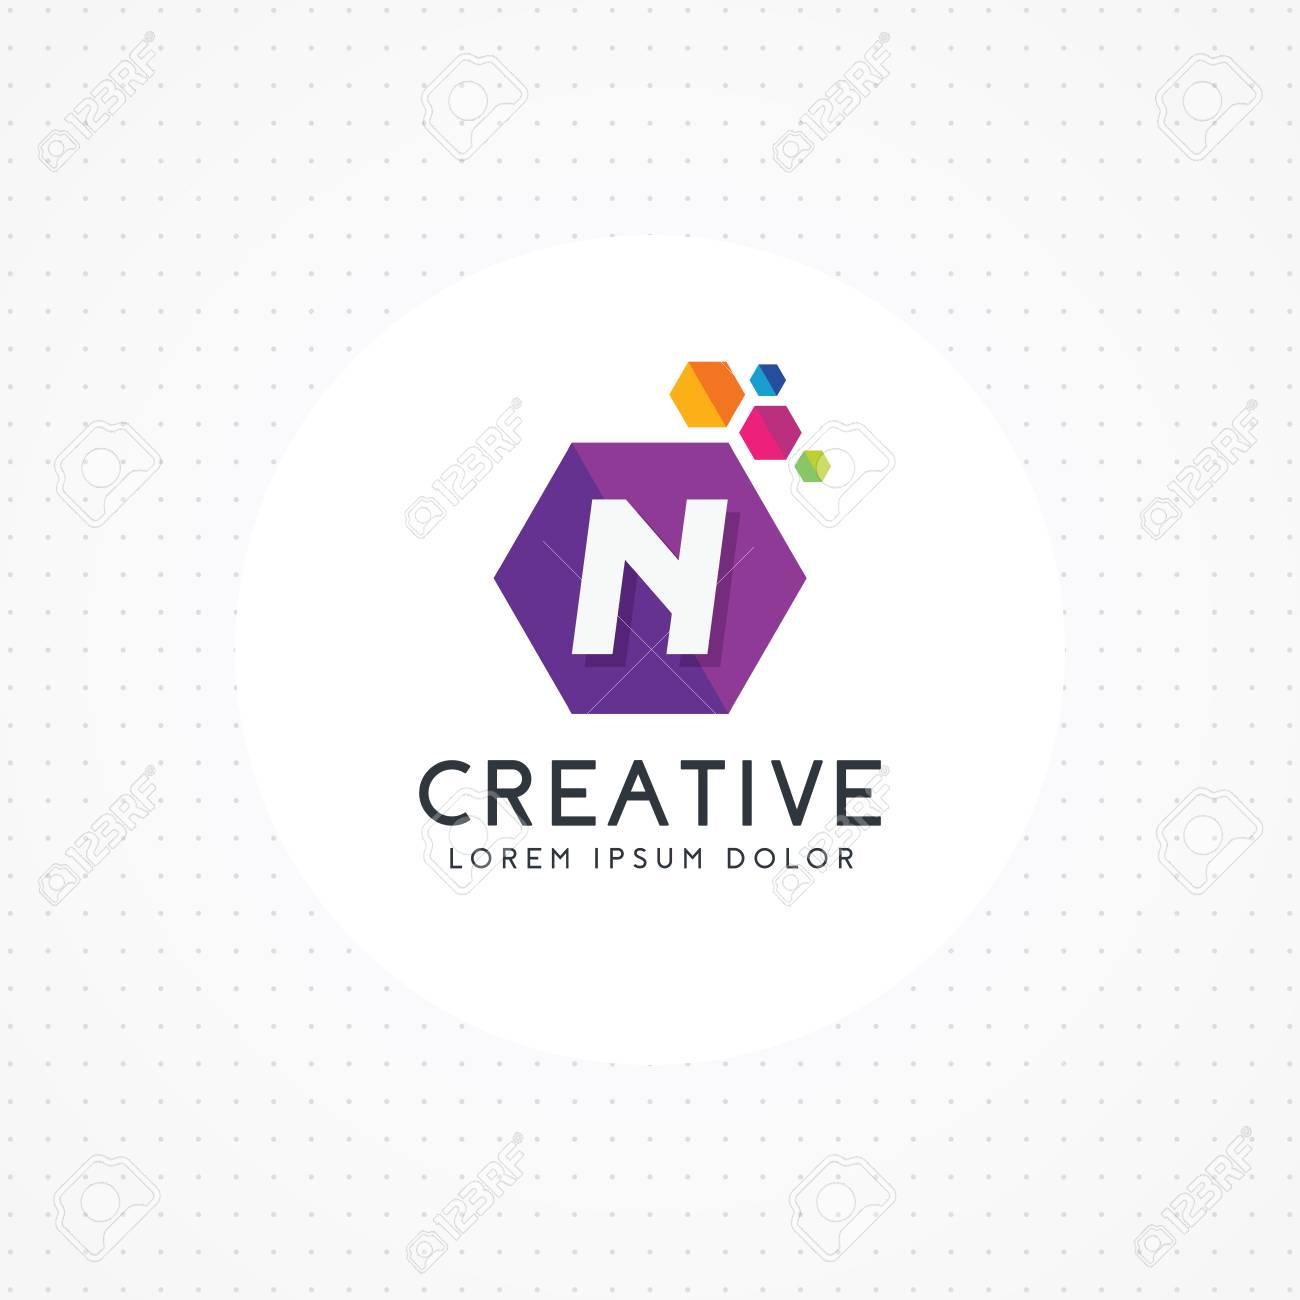 creative hexagonal letter n logo letter n logo design vector with hexagon vector logo